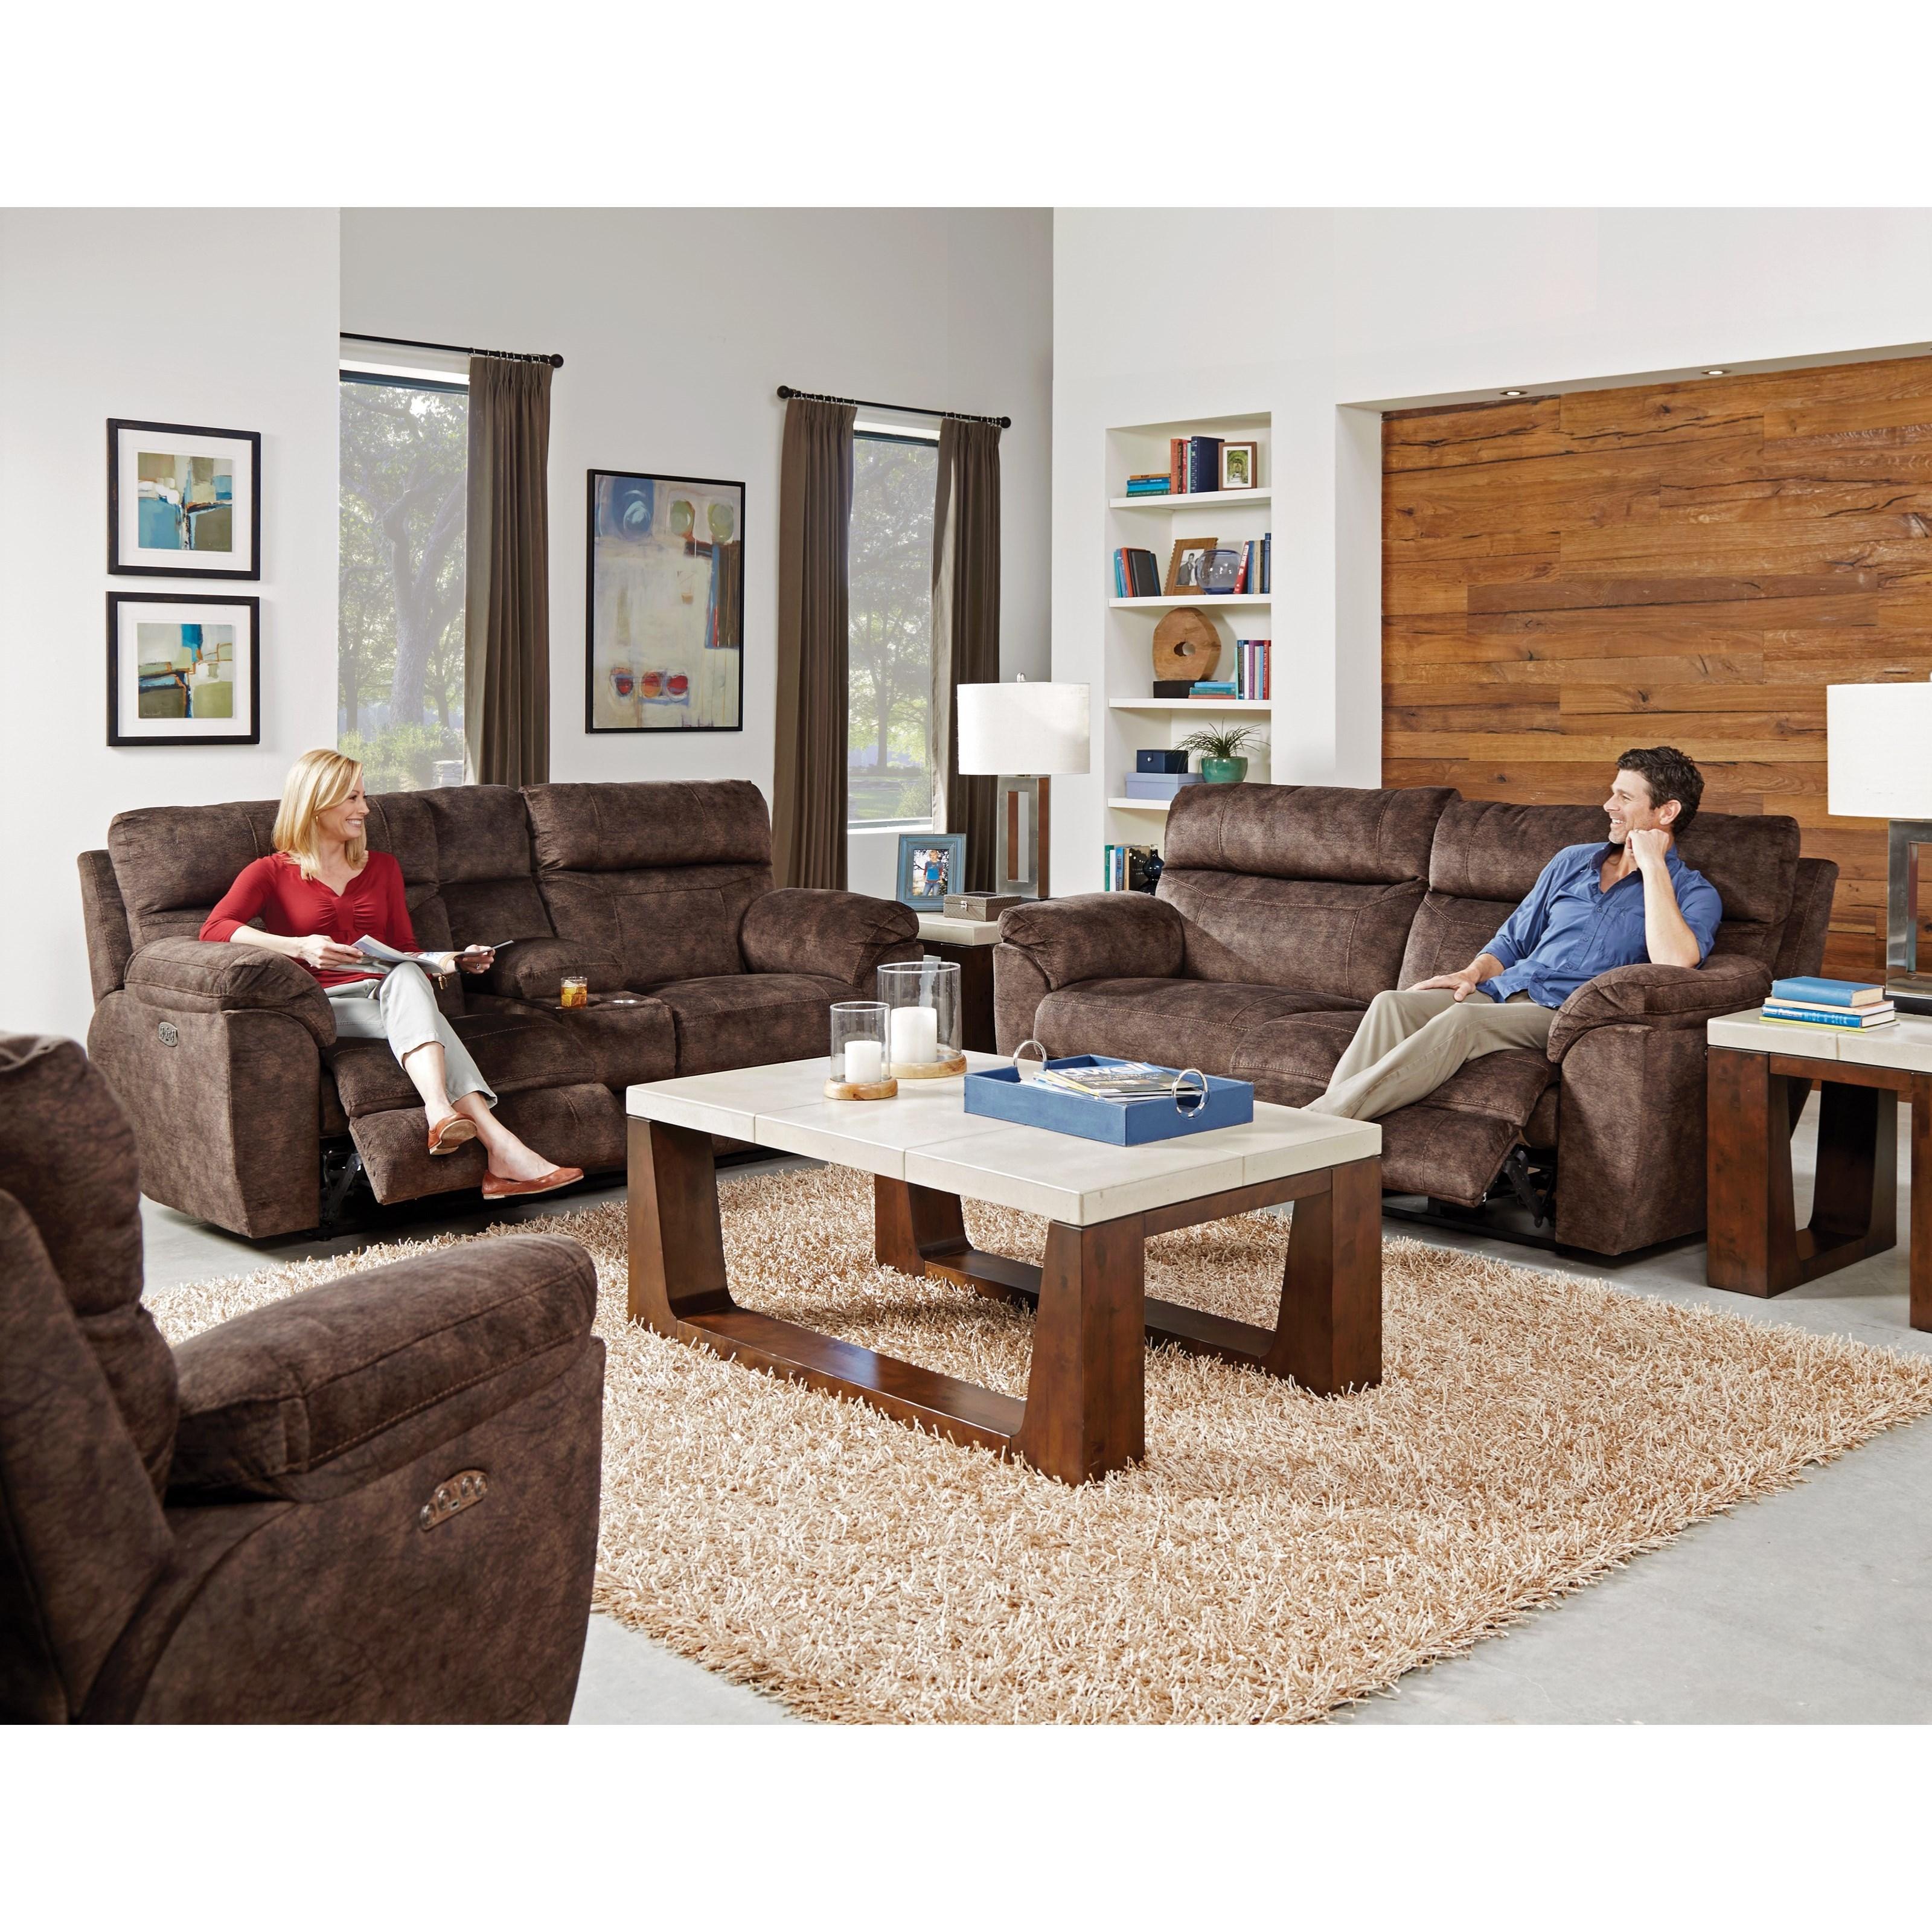 Sedona Reclining Living Room Group by Catnapper at Virginia Furniture Market